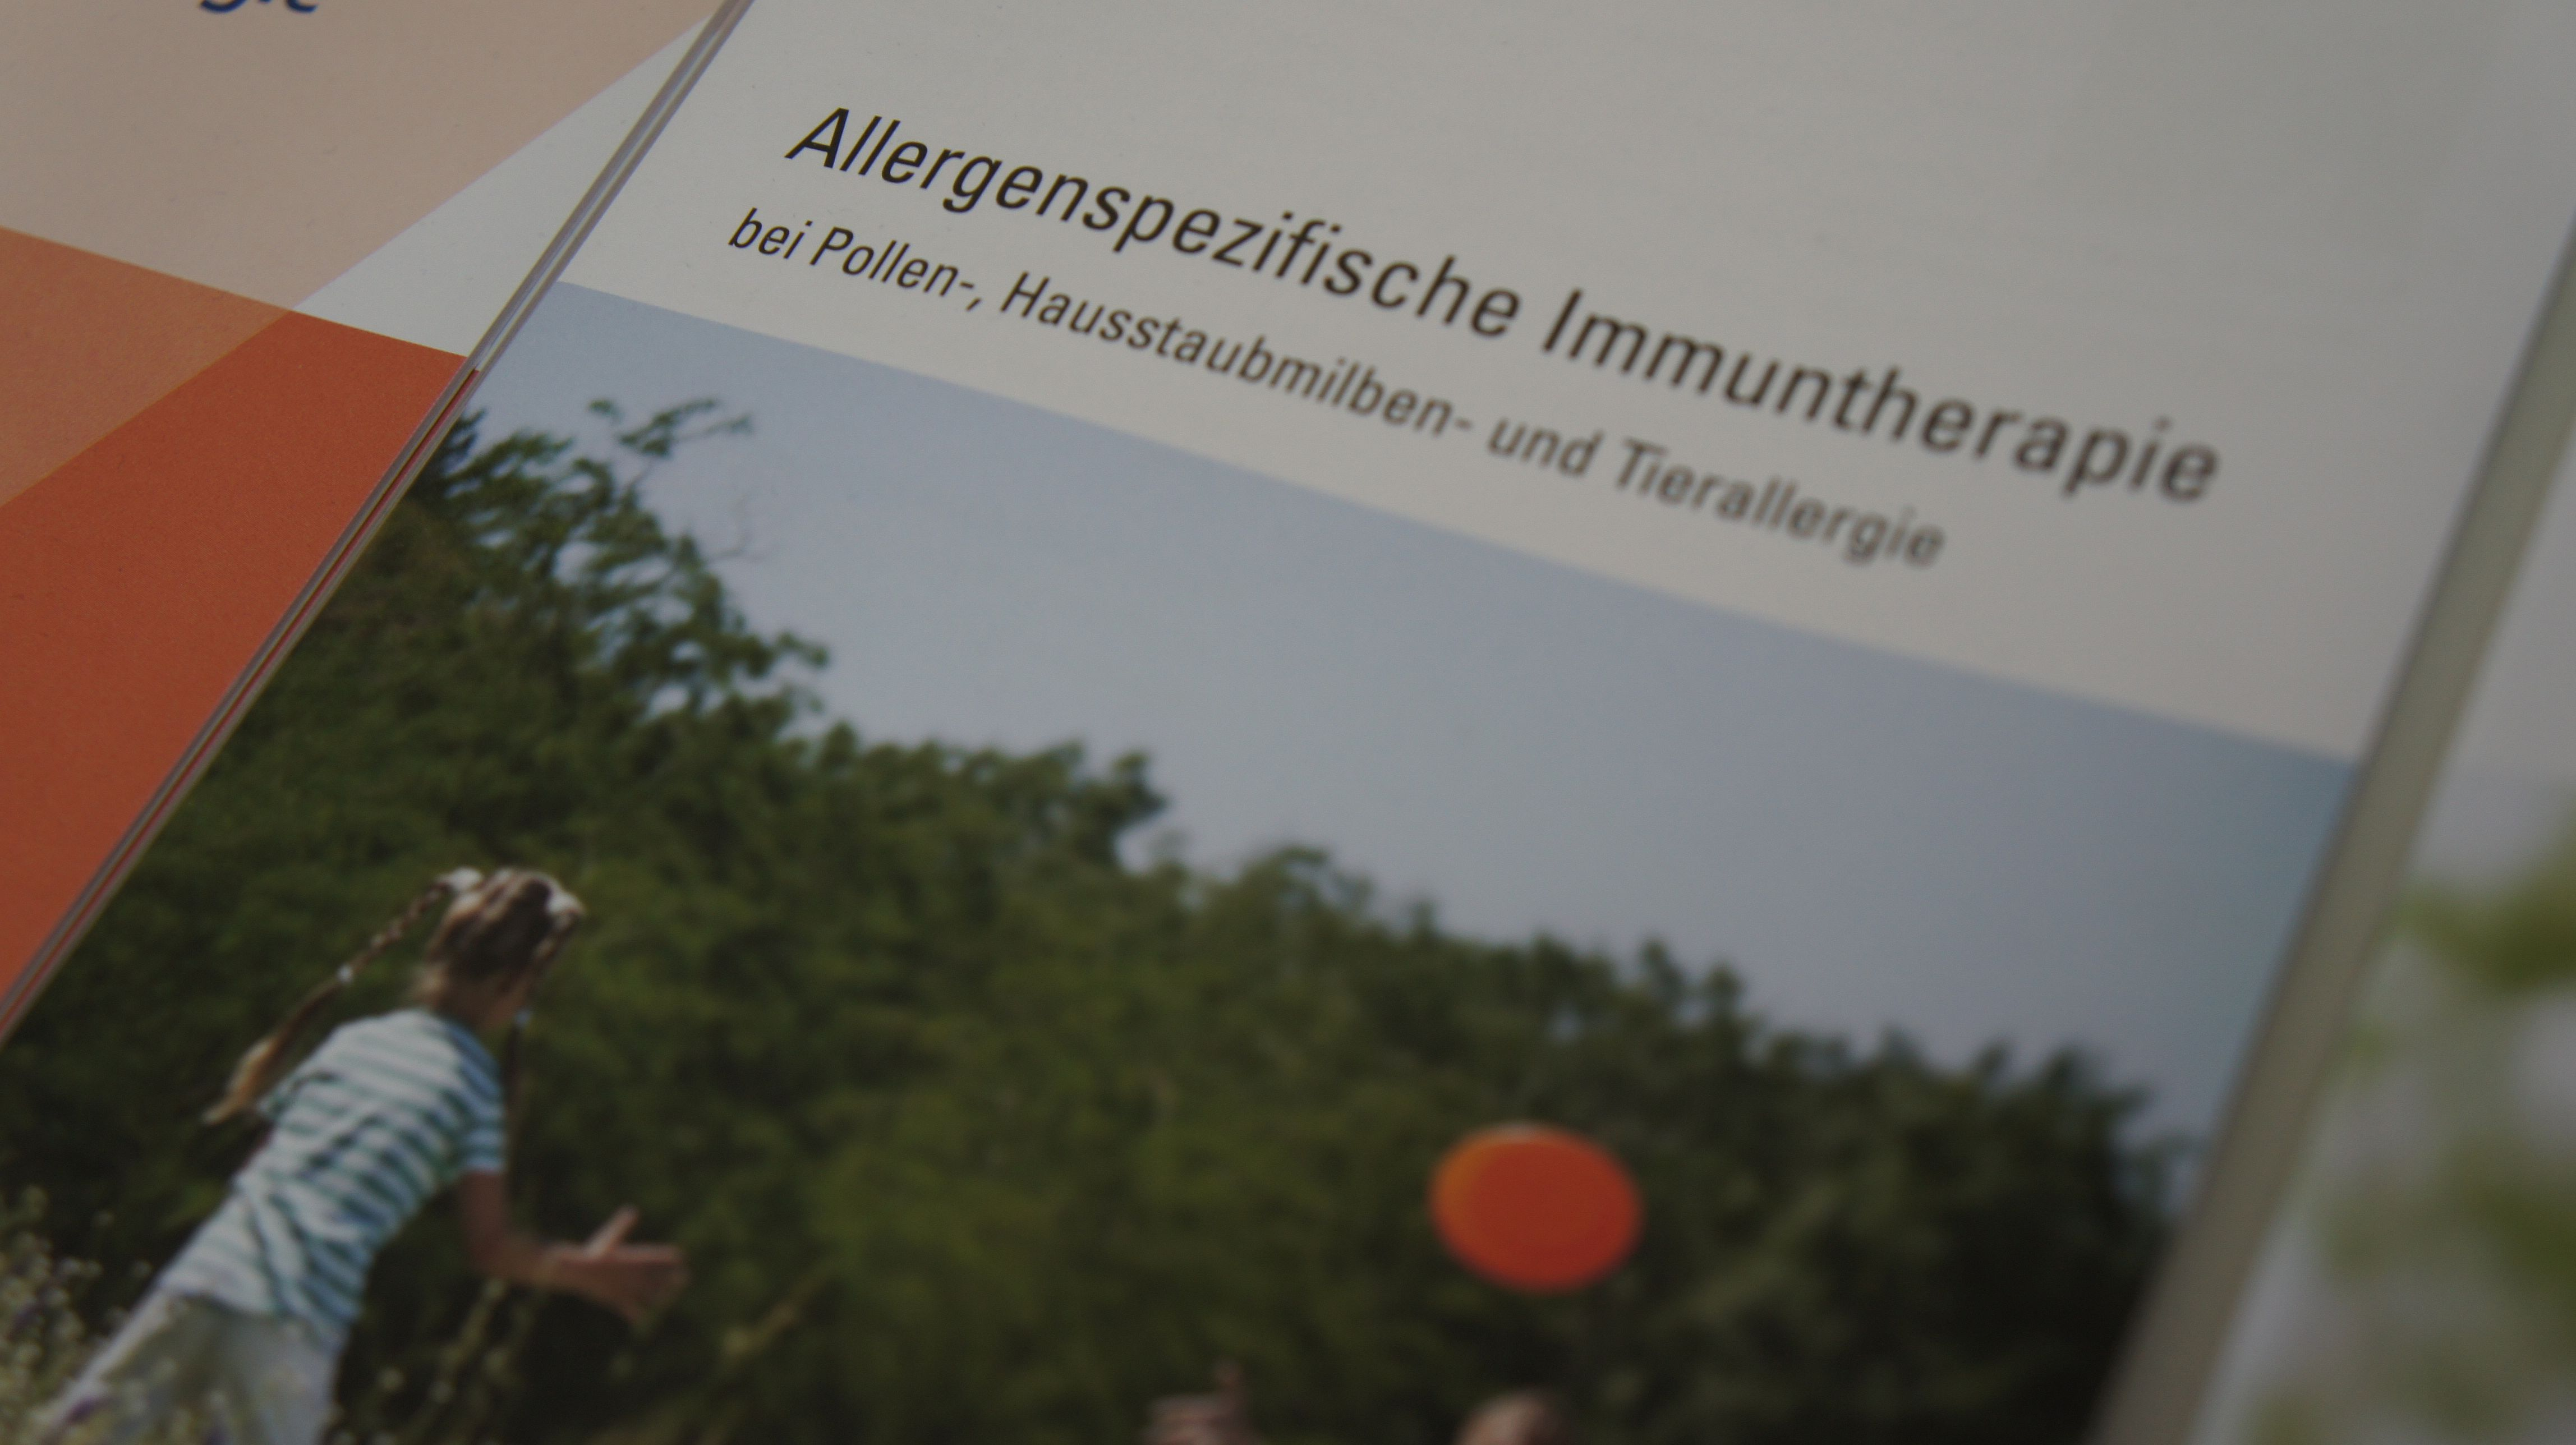 Immpuntherapie